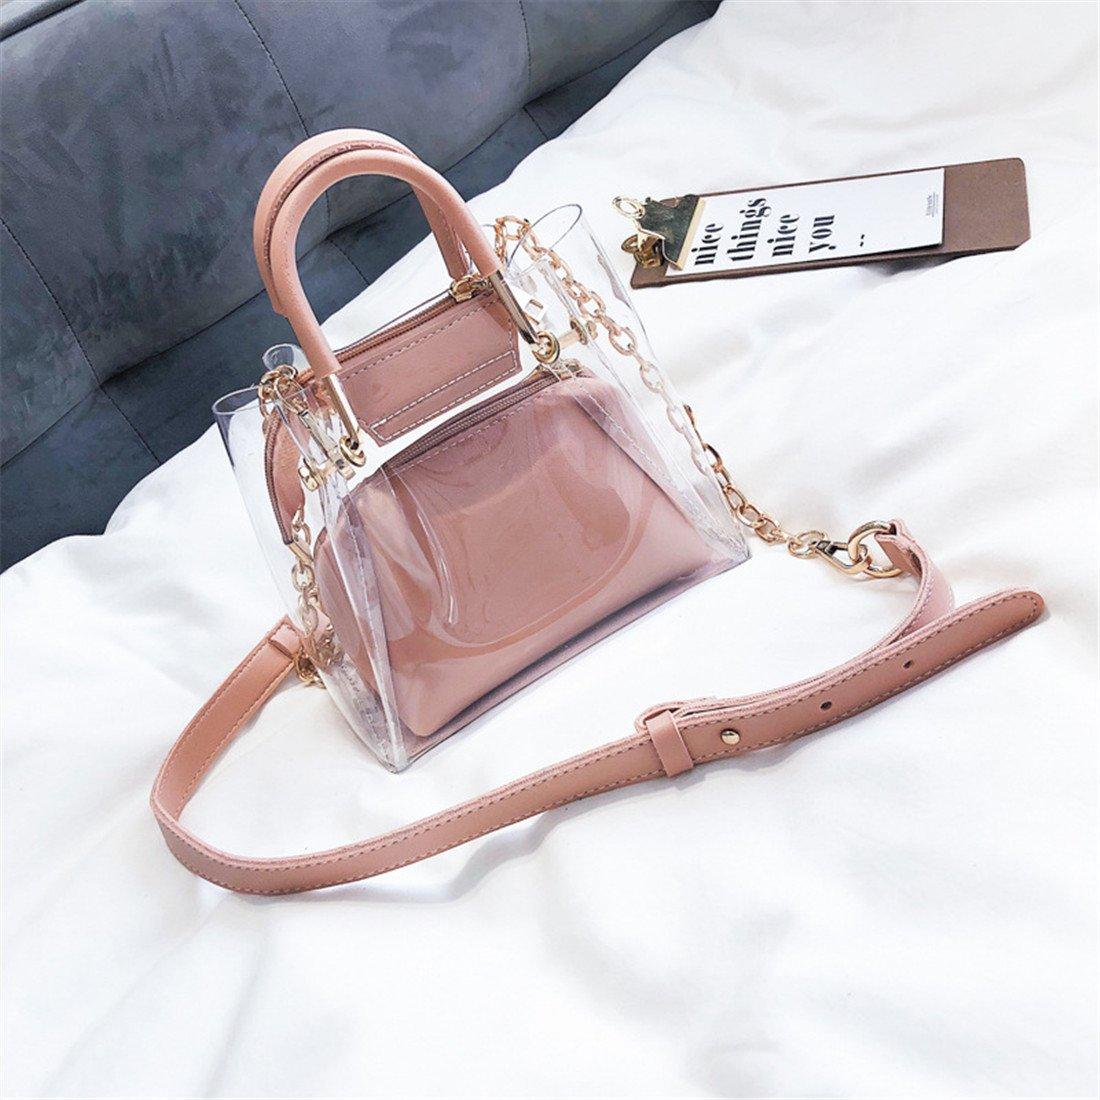 Luckywe PVC claro mujeres Cadena hermosa de jalea bolsas asa superior bolso carteras diseñador A10 Rosado: Amazon.es: Zapatos y complementos